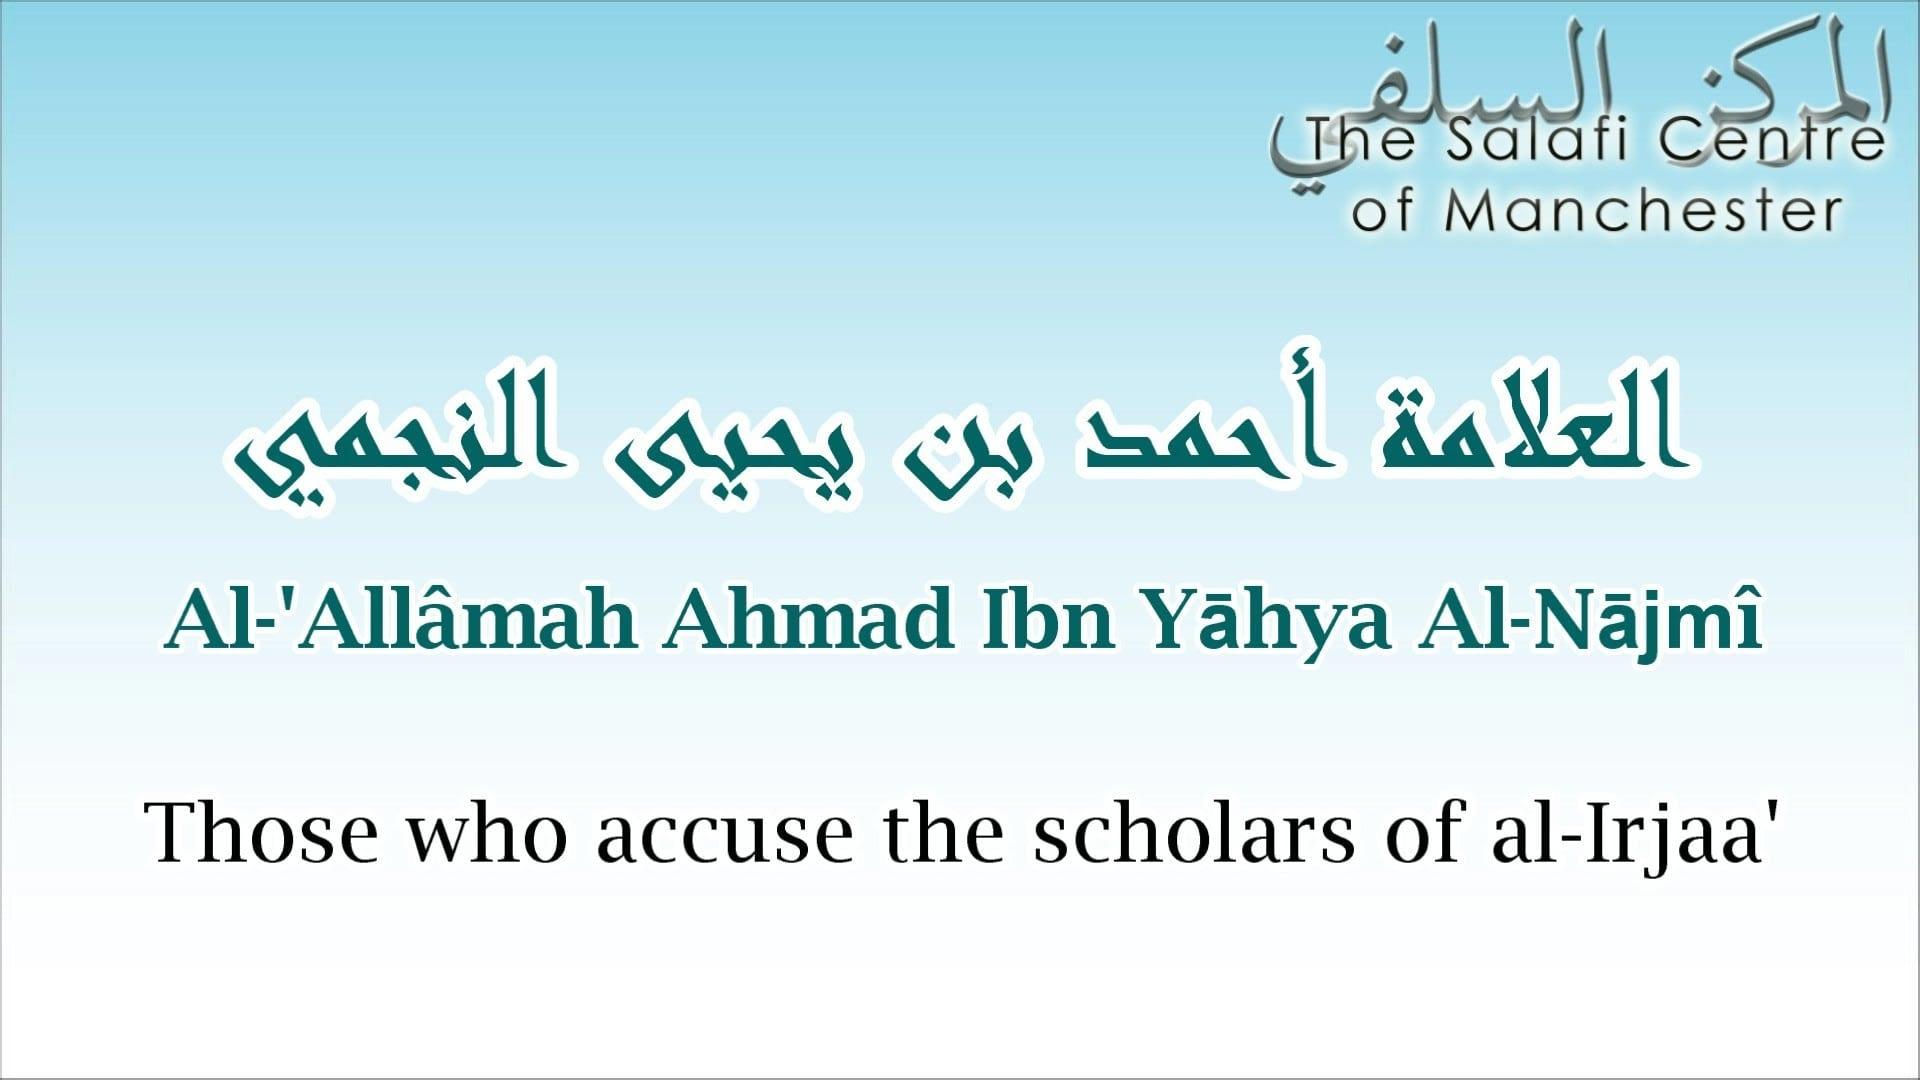 Those who accuse the scholars of al-Irjaa' | Al-'Allâmah Ahmad an-Najmī